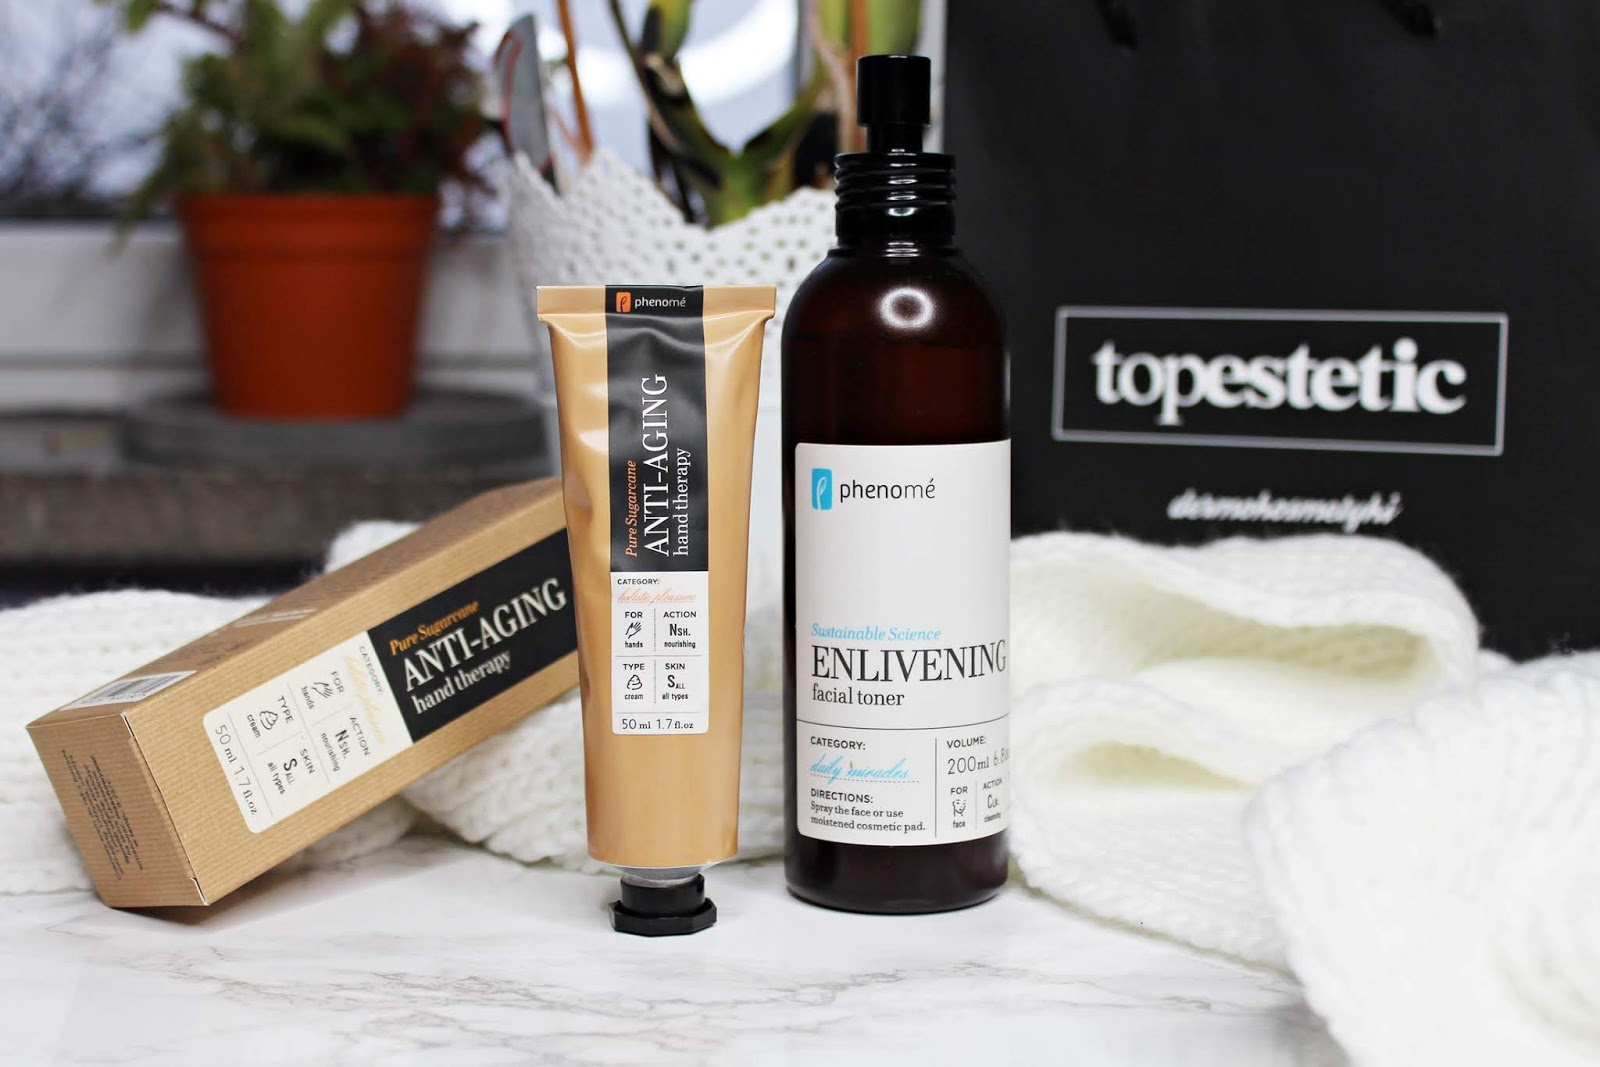 Phenomé - luksusowe, polskie i naturalne kosmetyki | topestetic.pl